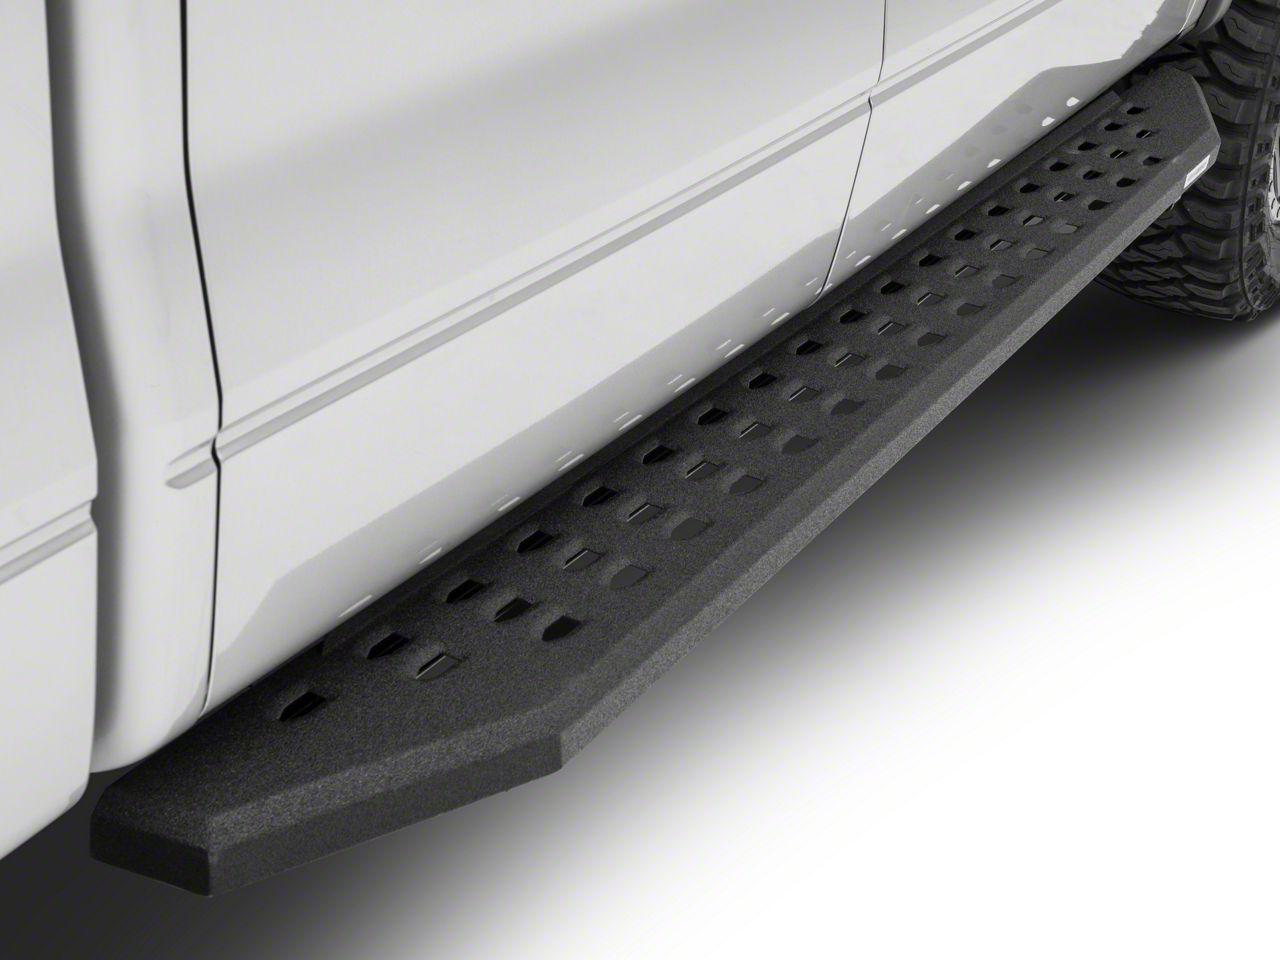 Go Rhino RB20 Running Boards - Black Bedliner Coating (04-14 F-150 SuperCrew)